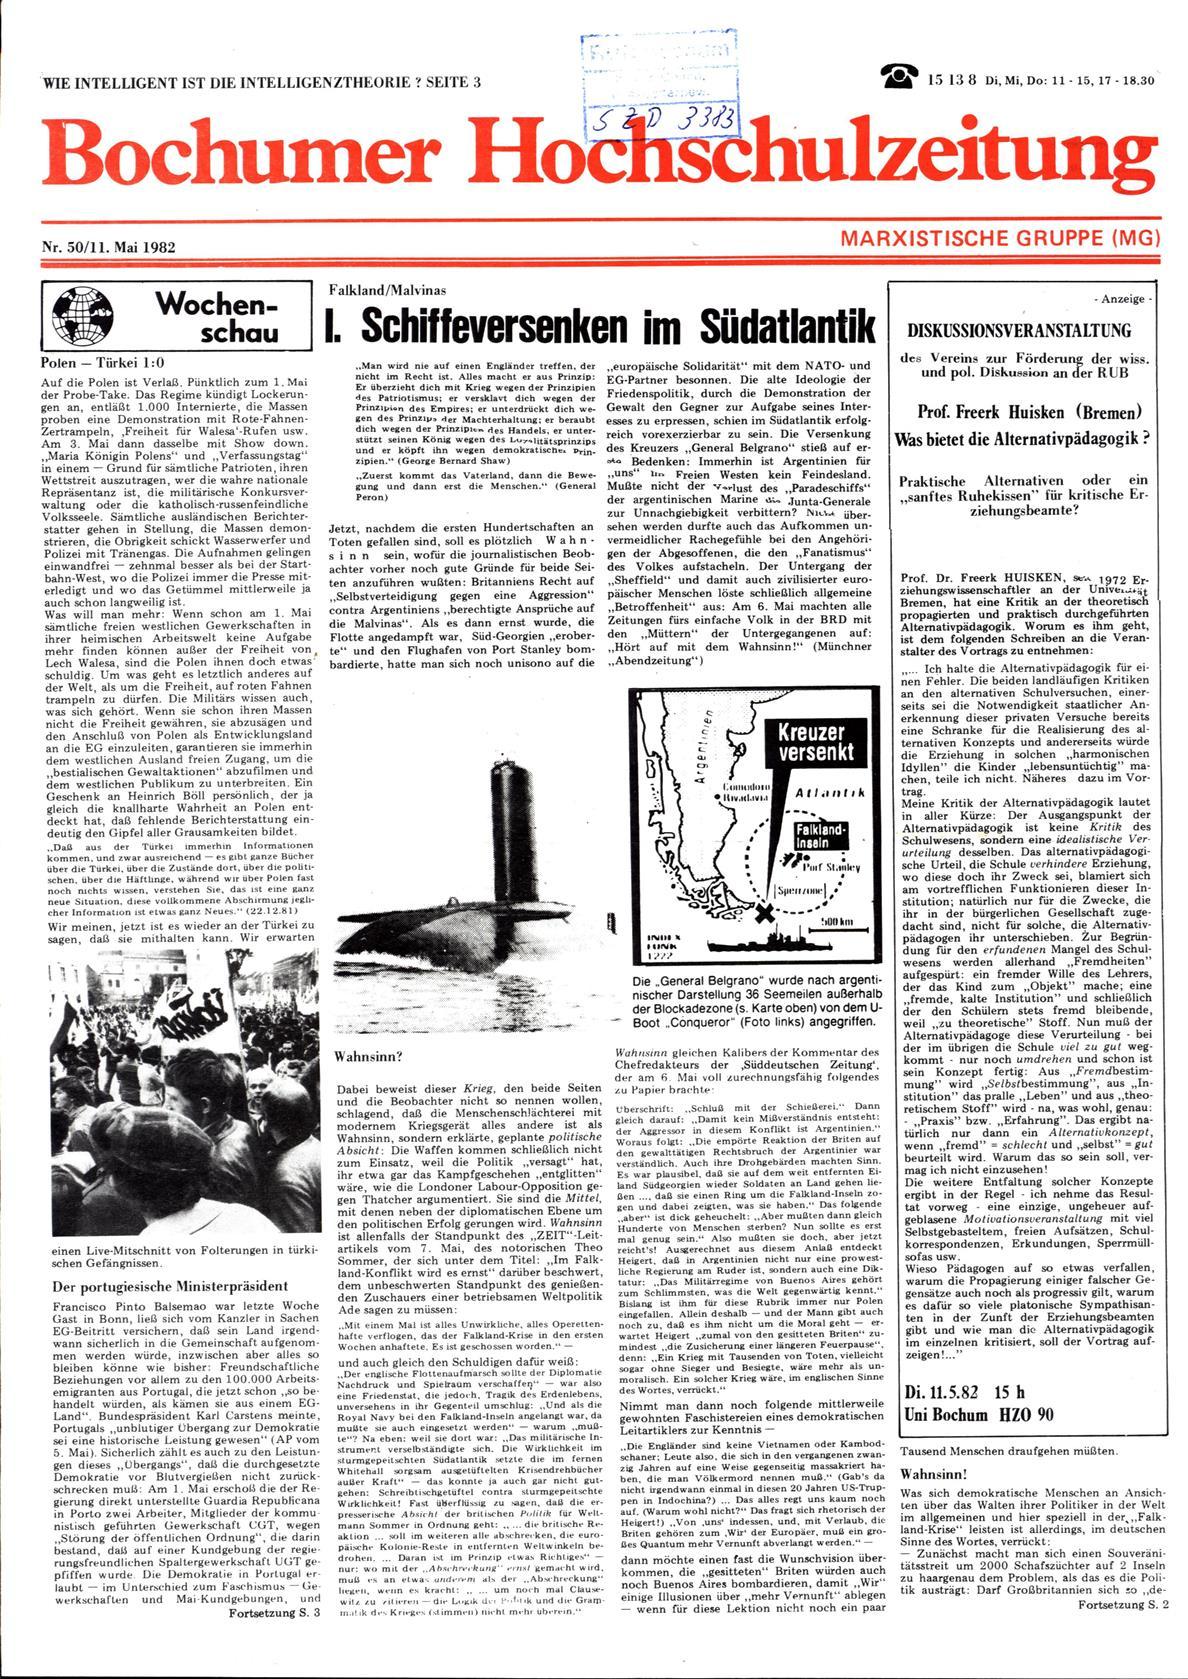 Bochum_BHZ_19820511_050_001